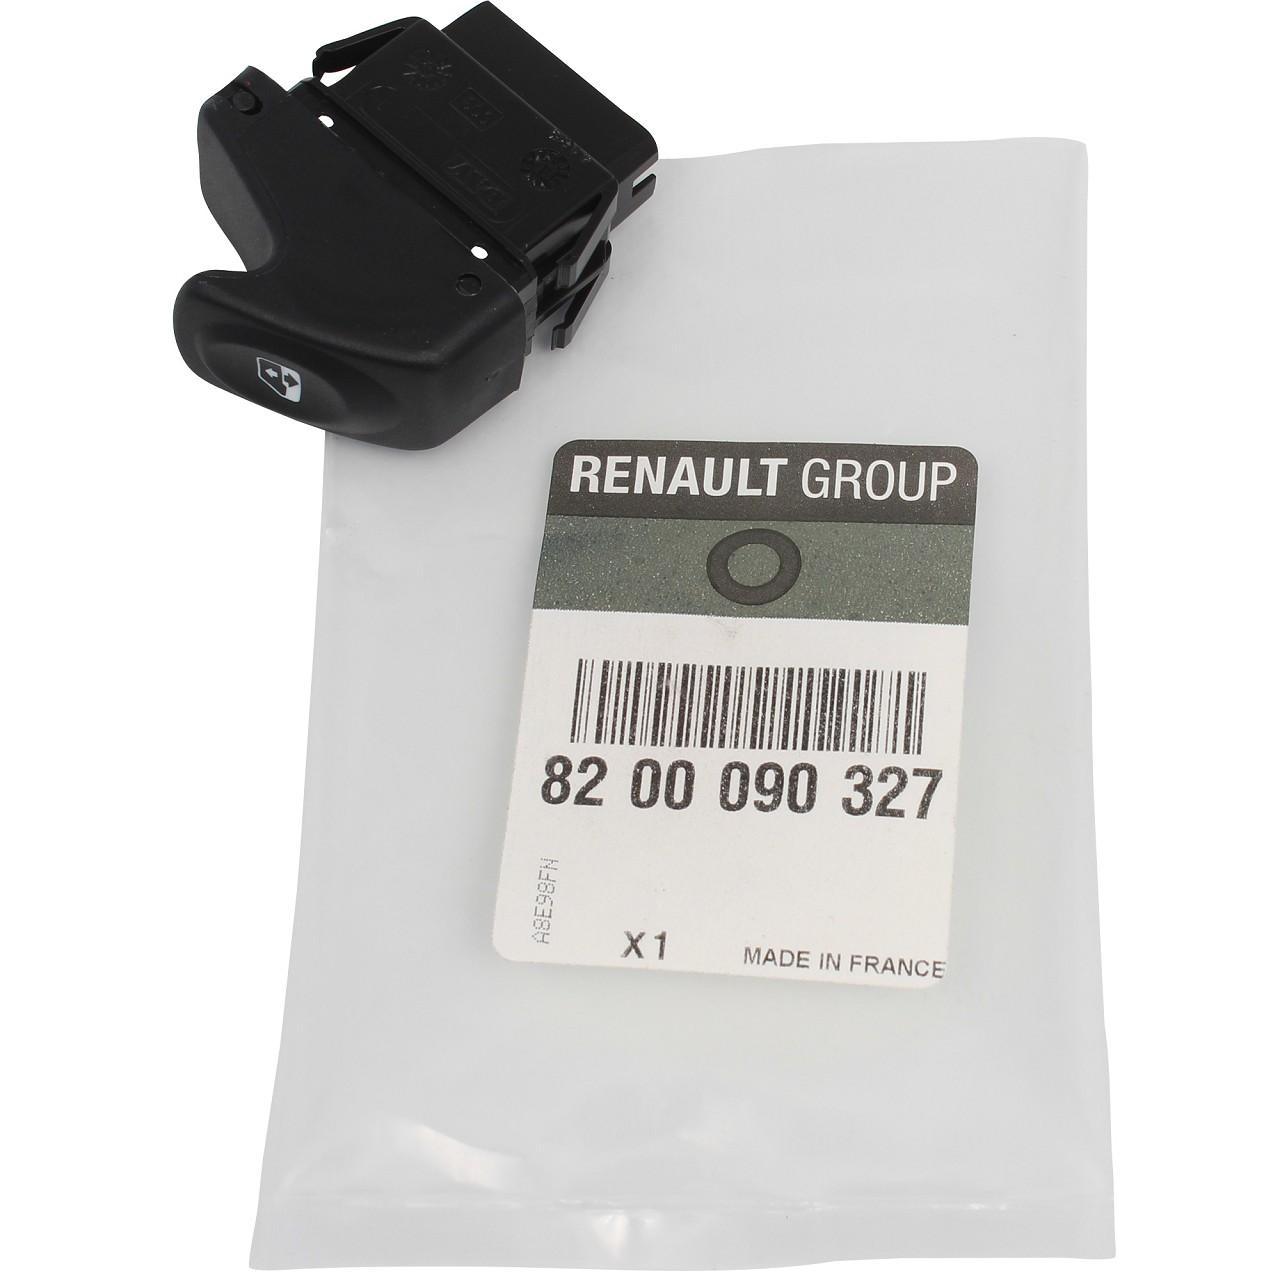 ORIGINAL Renault Schalter Fensterheber 6-polig Kangoo 8200090327